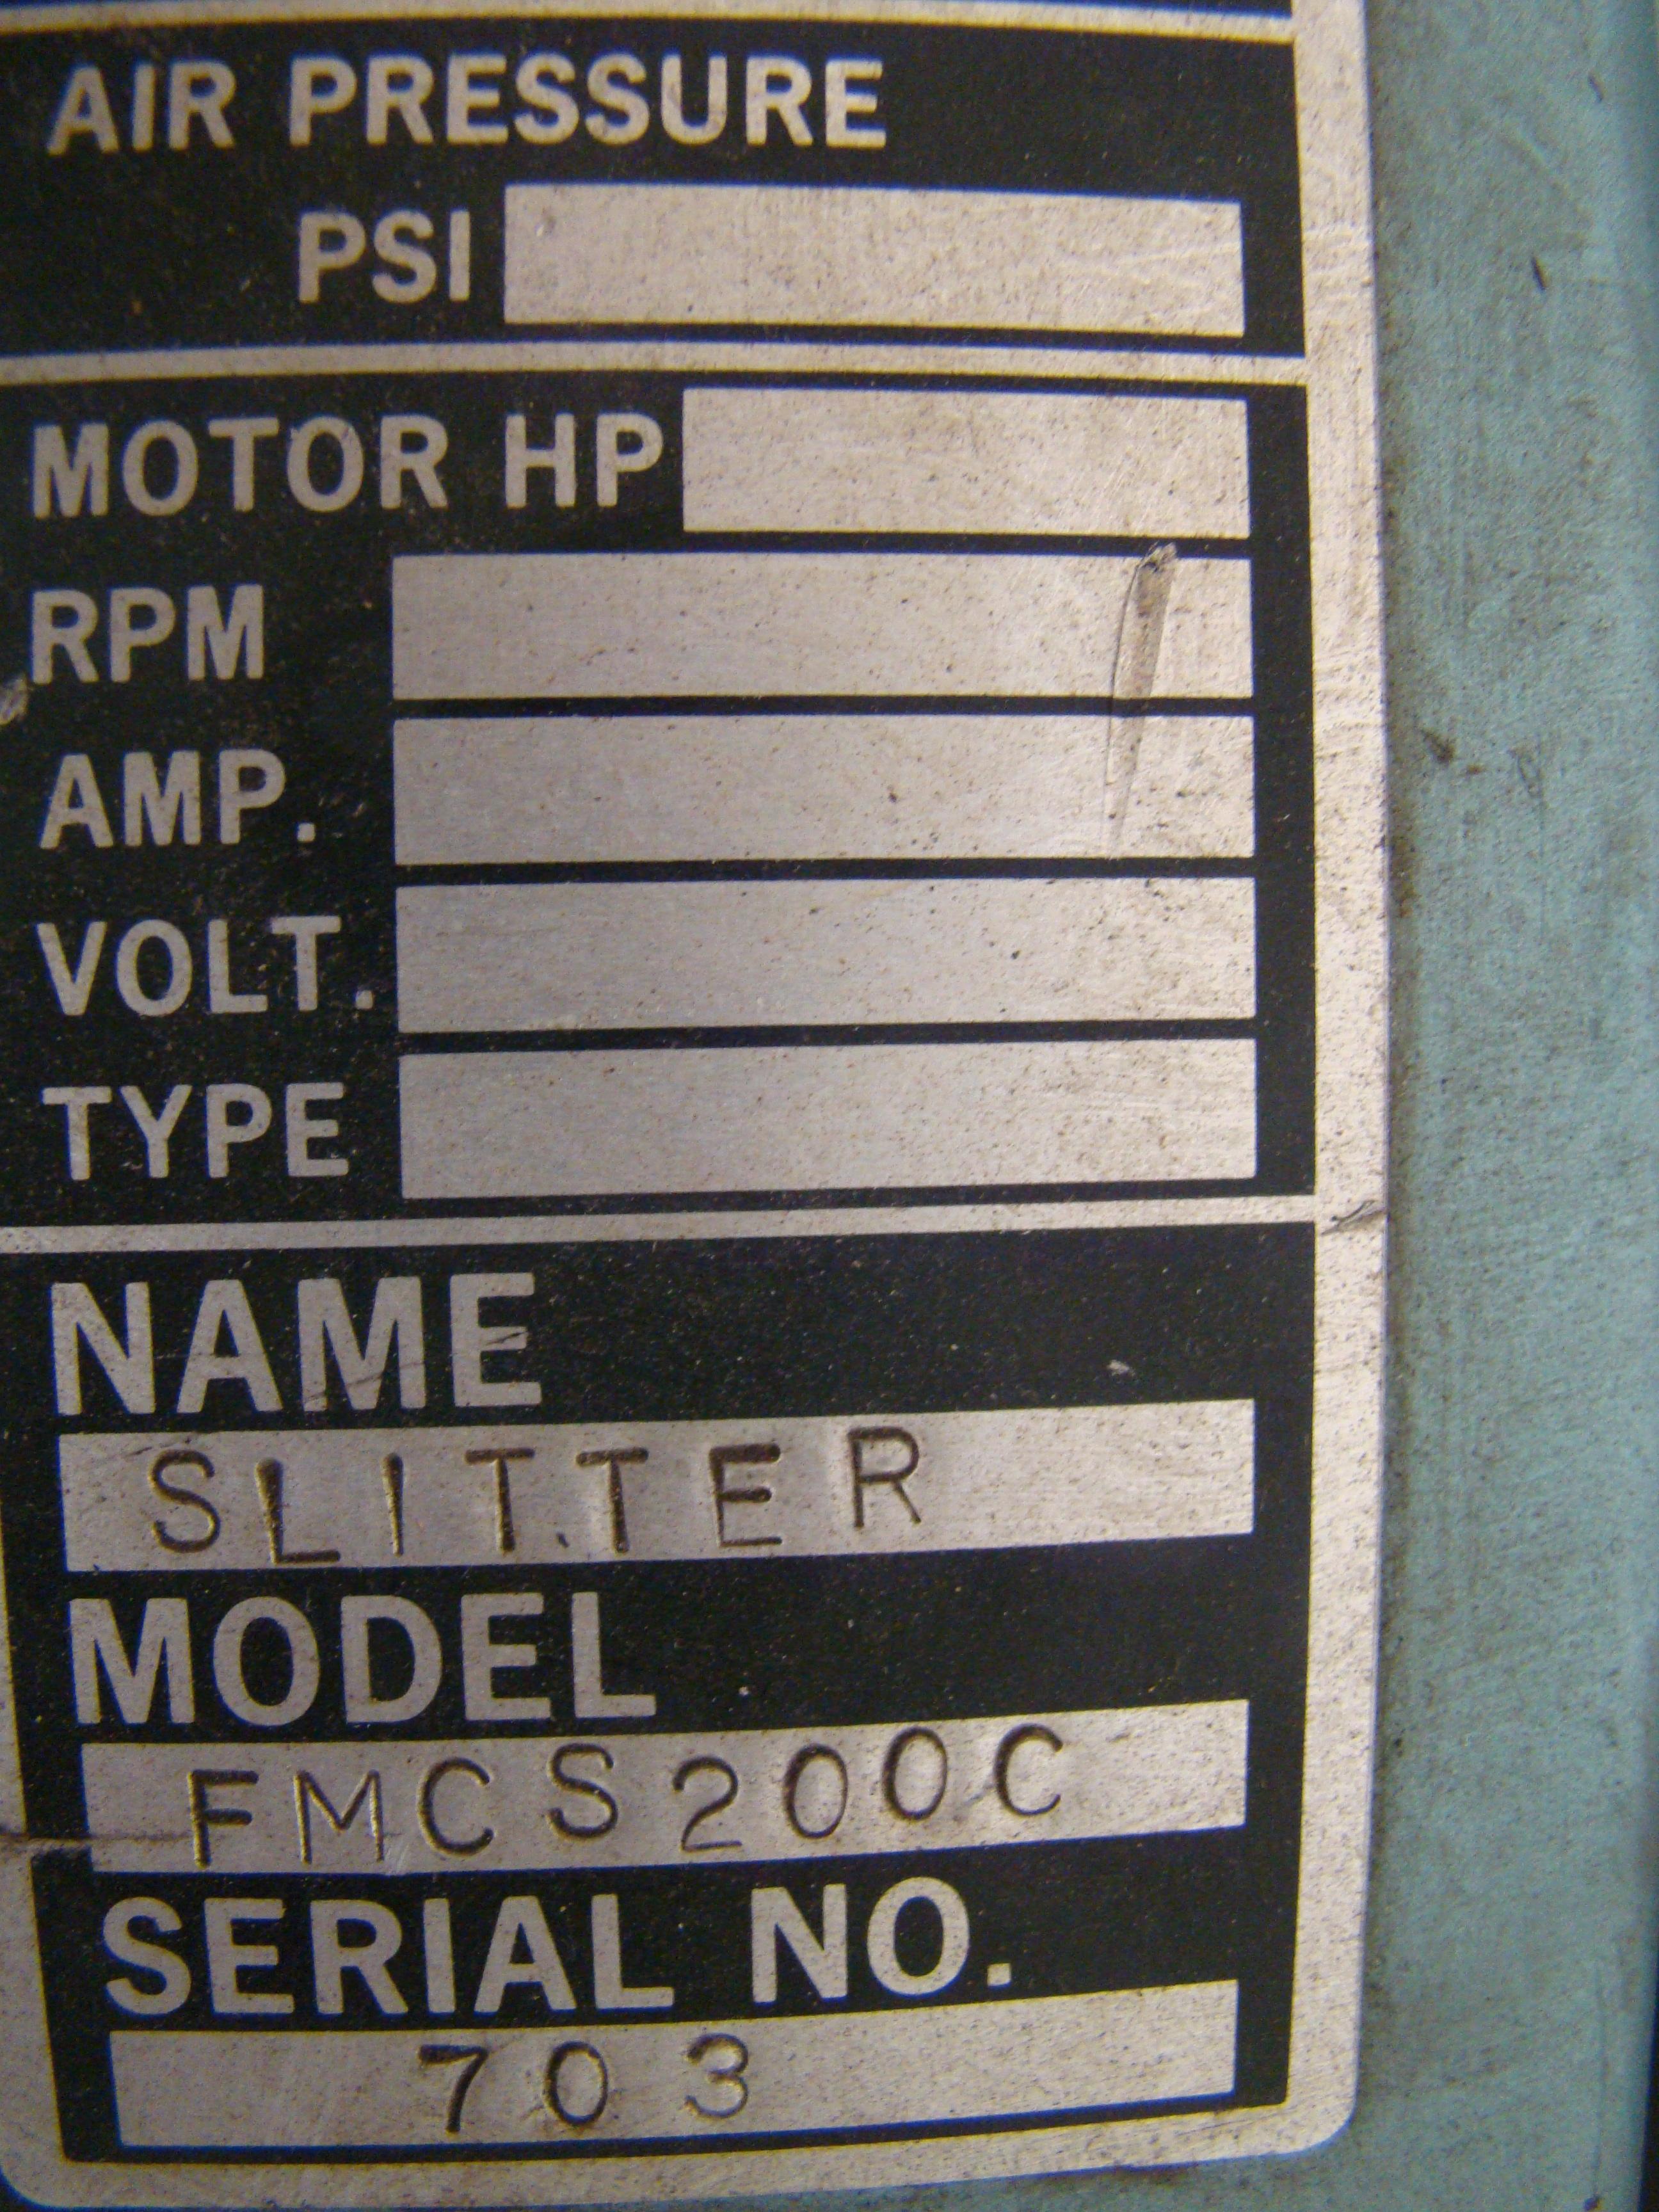 "Falcon 14"" Laminate Slitter Model FMCS200C 1/3HP 115/230 Volt - Image 4 of 6"